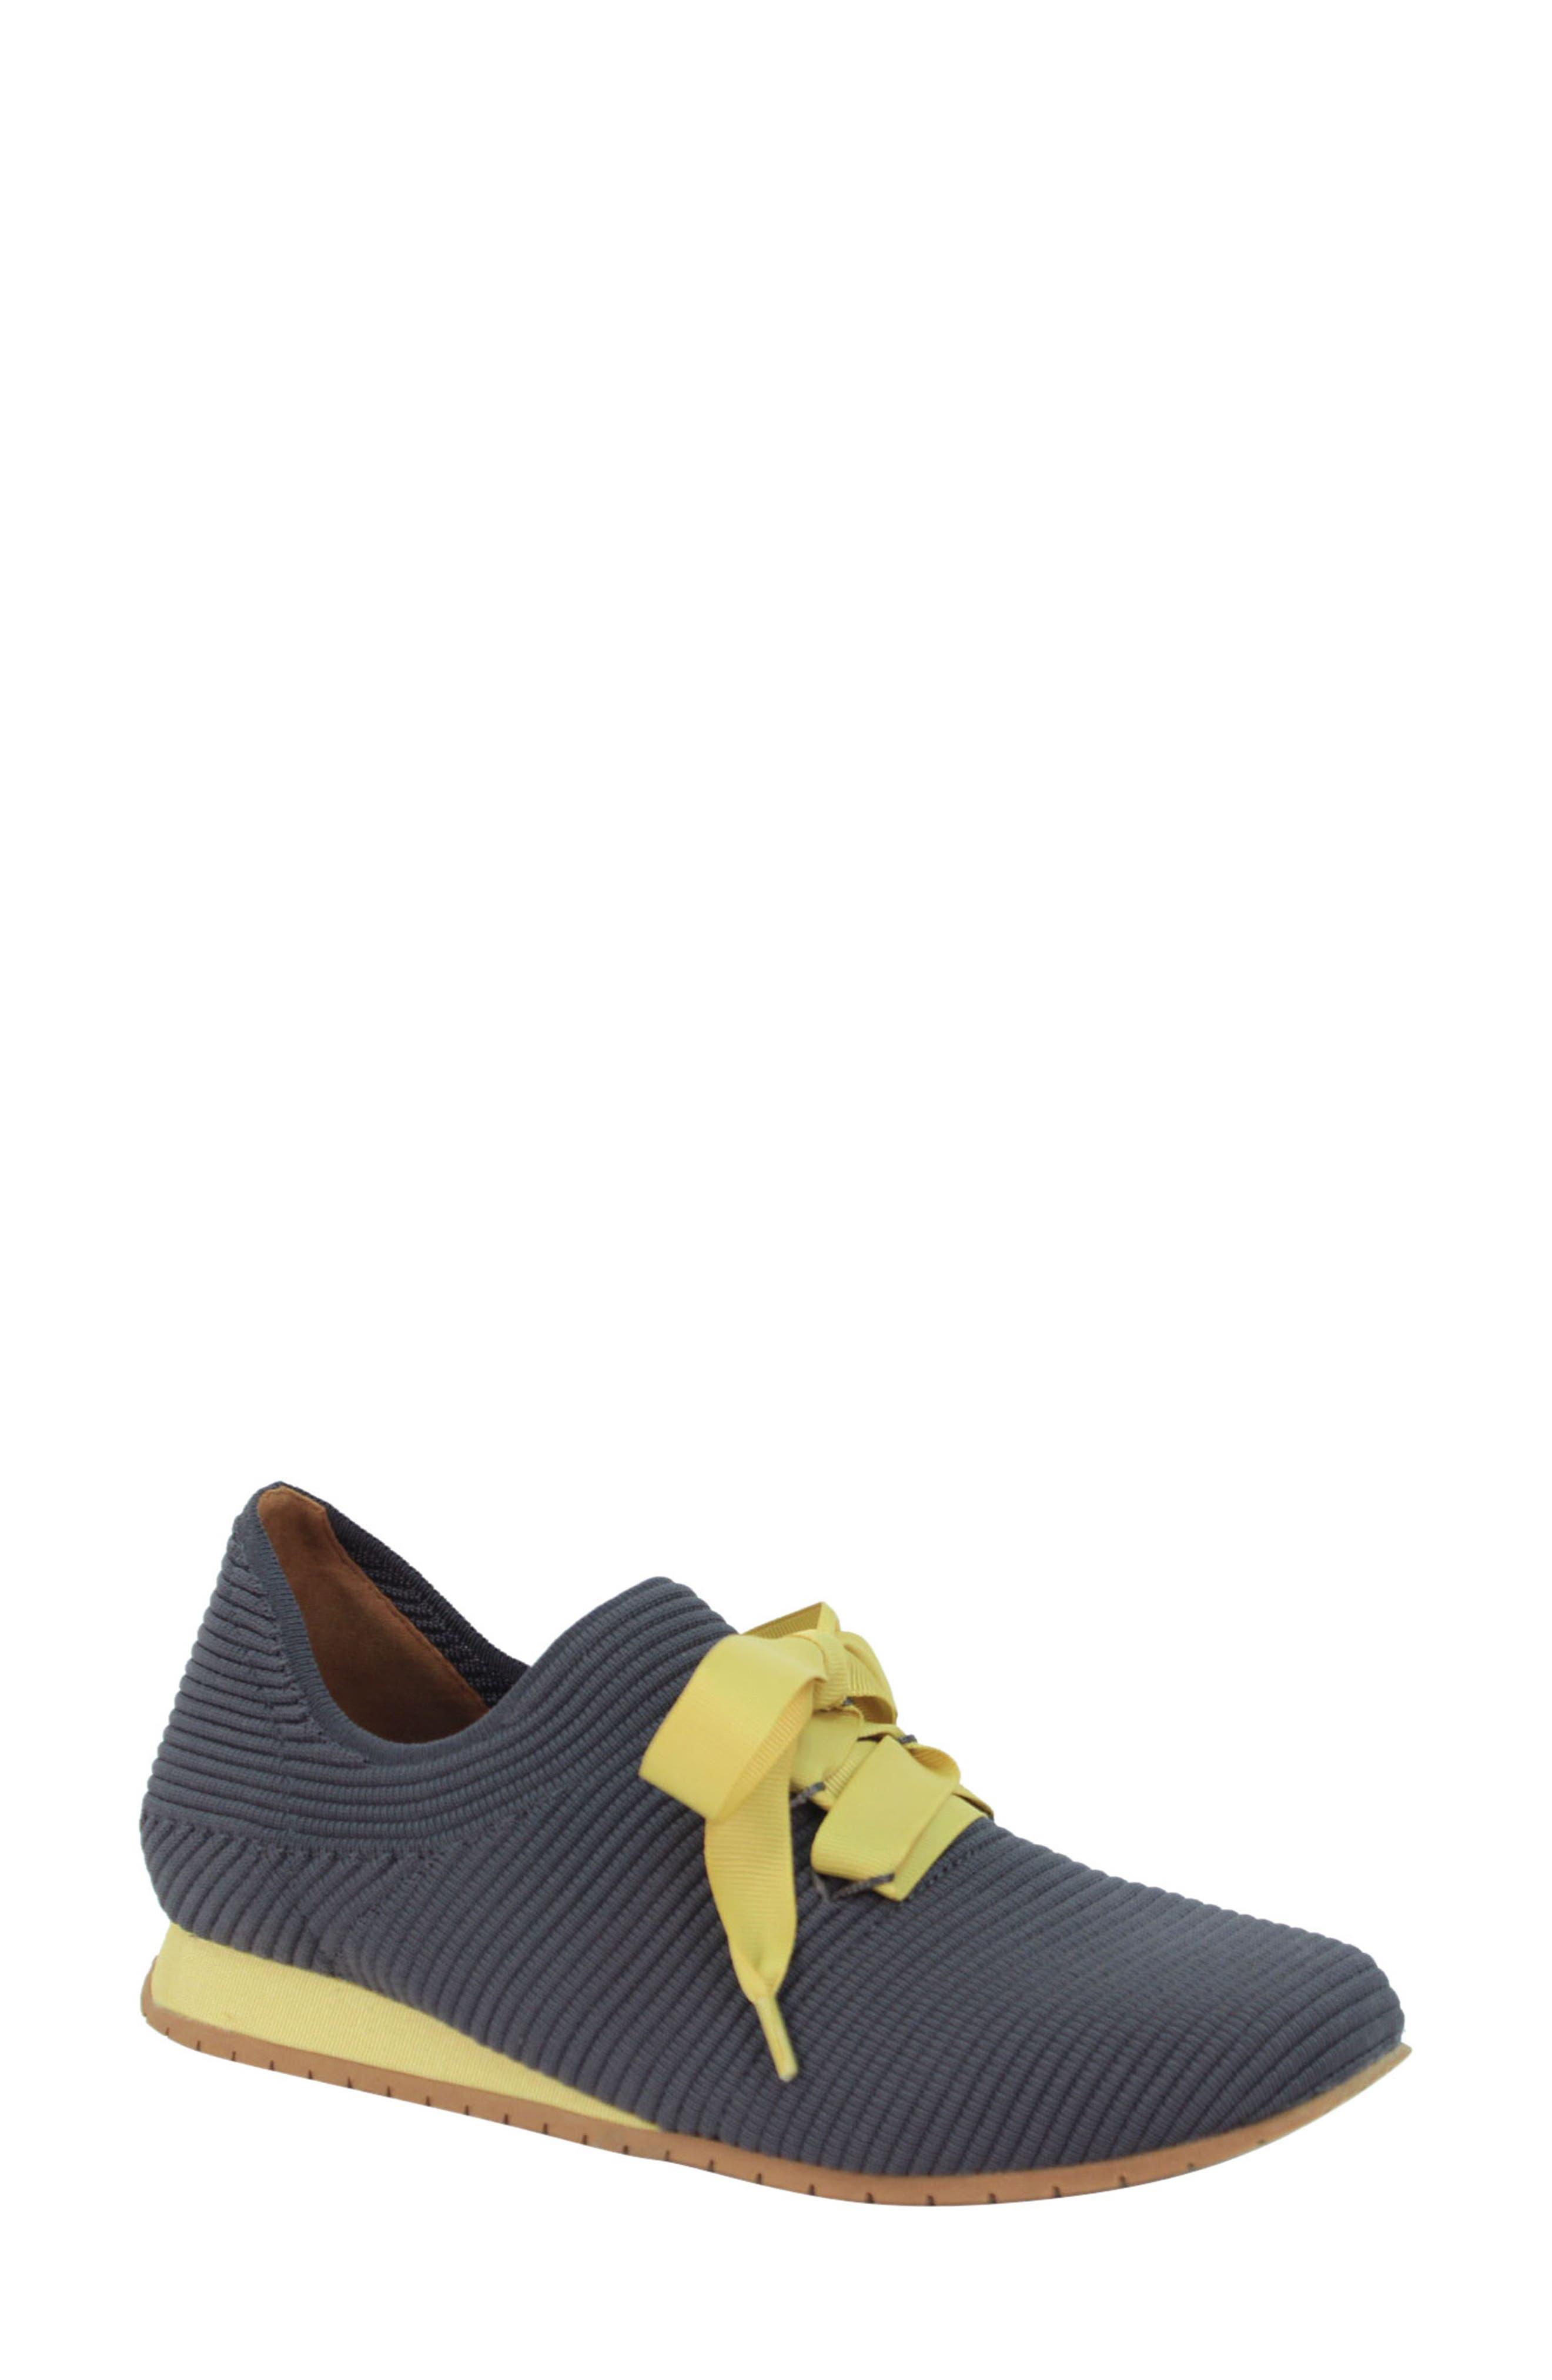 L'AMOUR DES PIEDS, Taimah Sneaker, Main thumbnail 1, color, DARK GREY/ YELLOW FABRIC